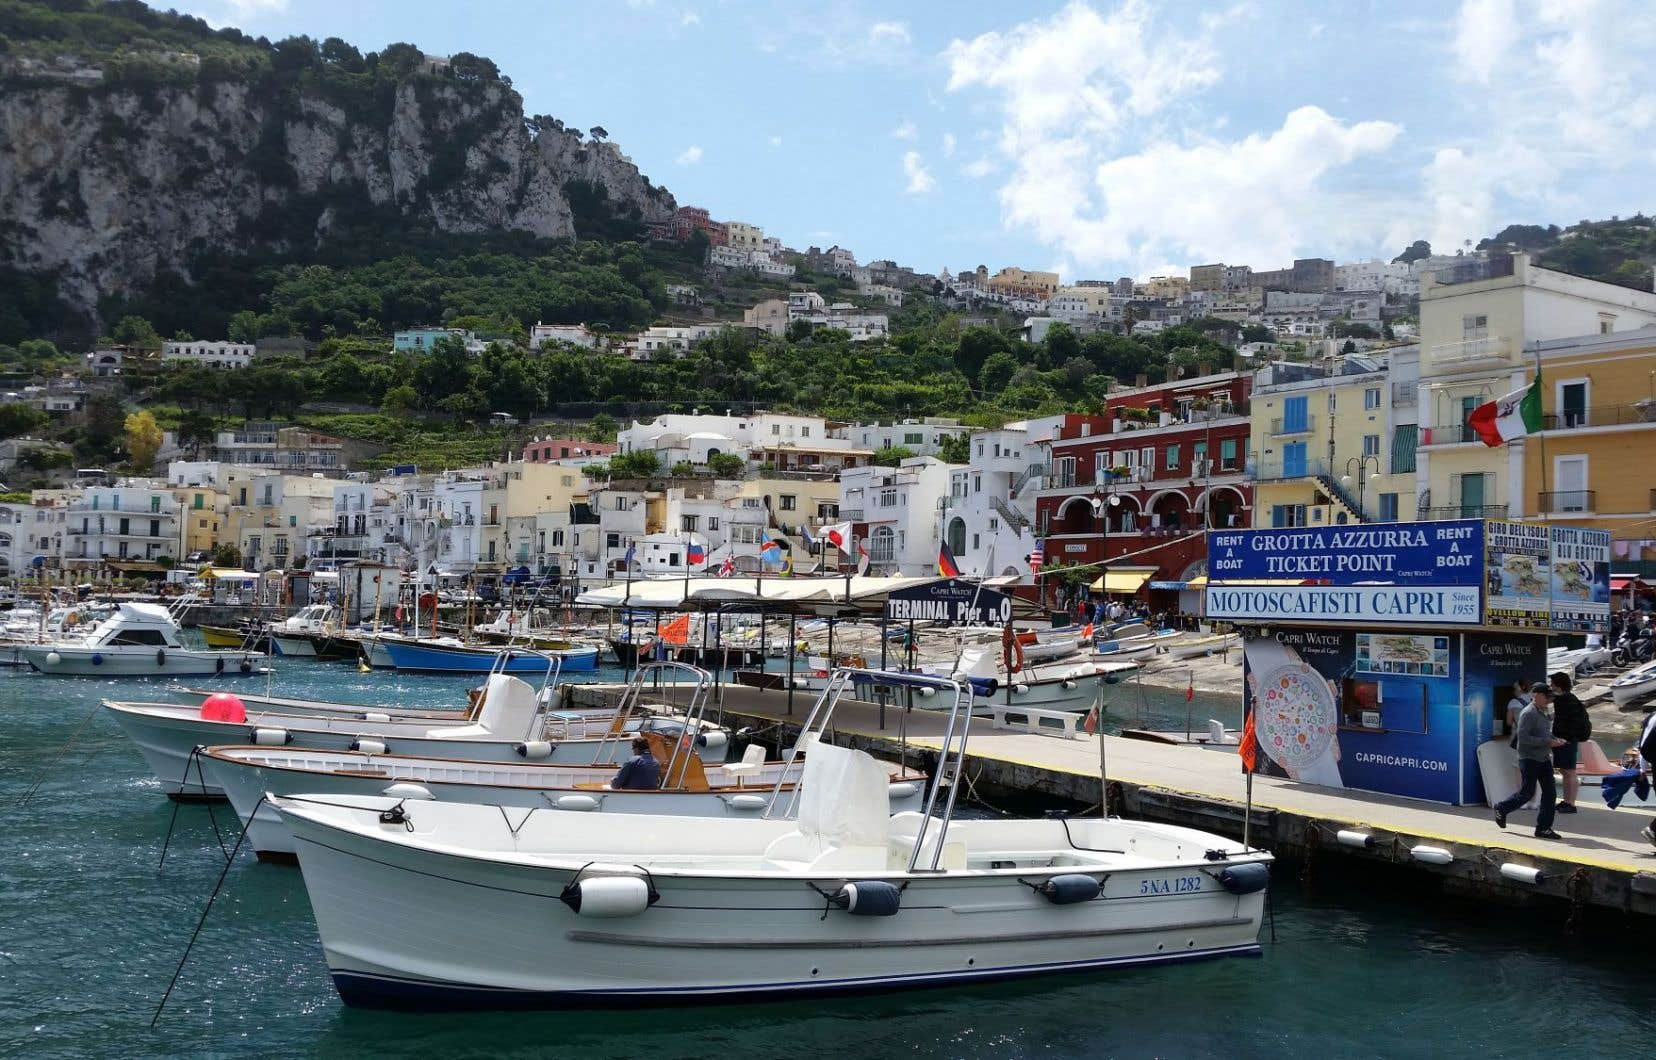 Marina Grande, le port principal de l'île de Capri, en Italie, là où l'amour est bien présent.